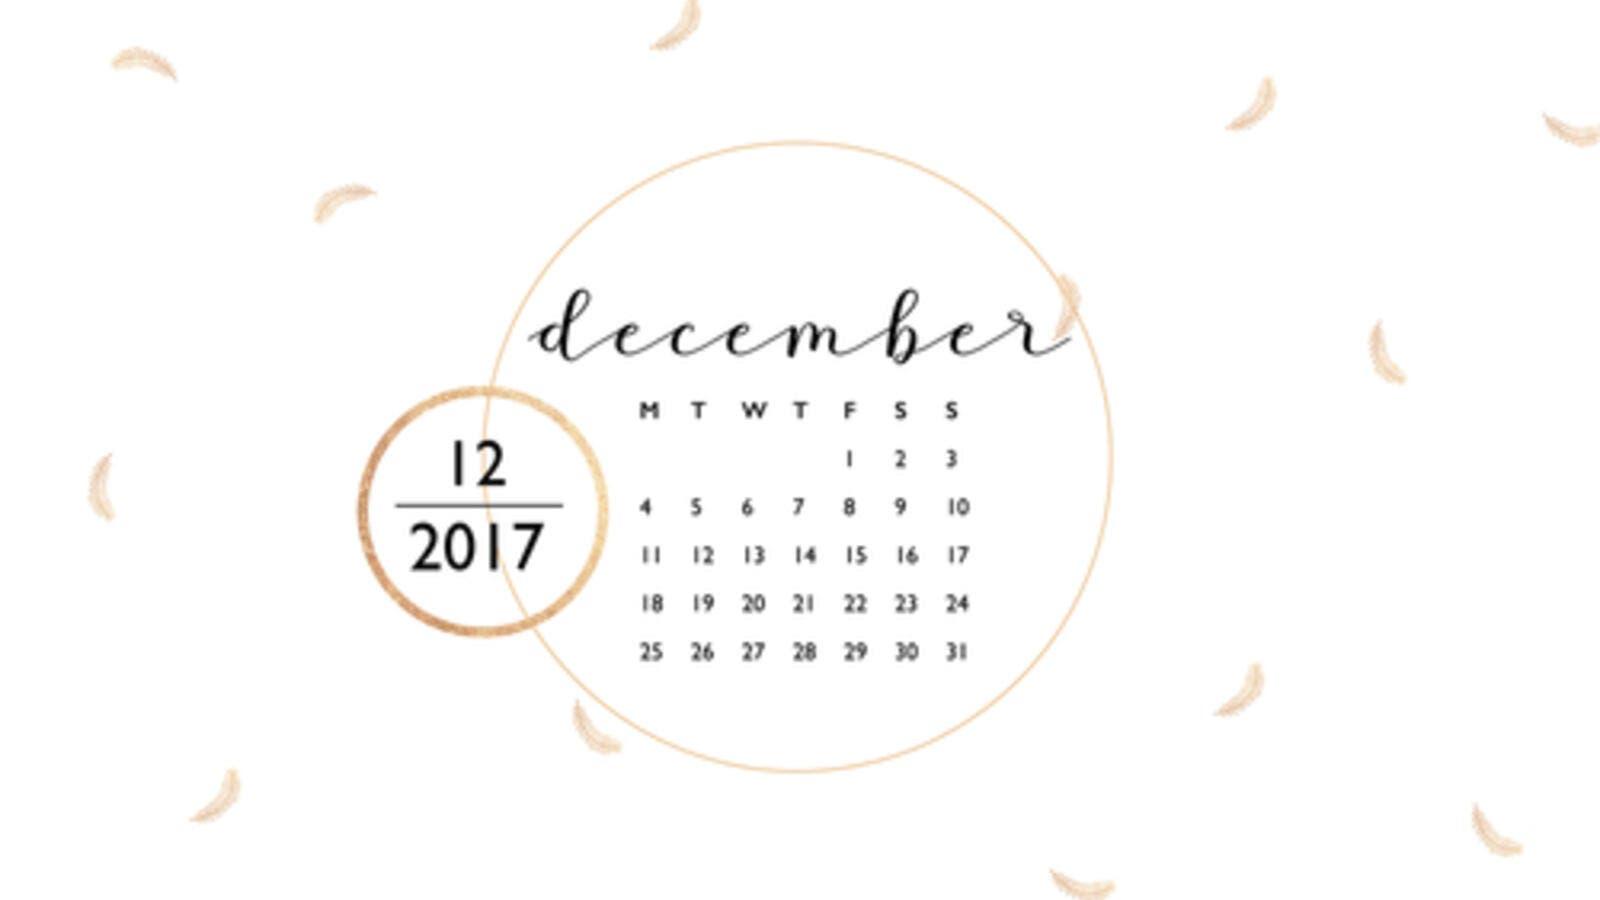 6ed4255abeb99 توقعات الأبراج لشهر كانون الأول  ديسمبر 2017 من كارمن شماس